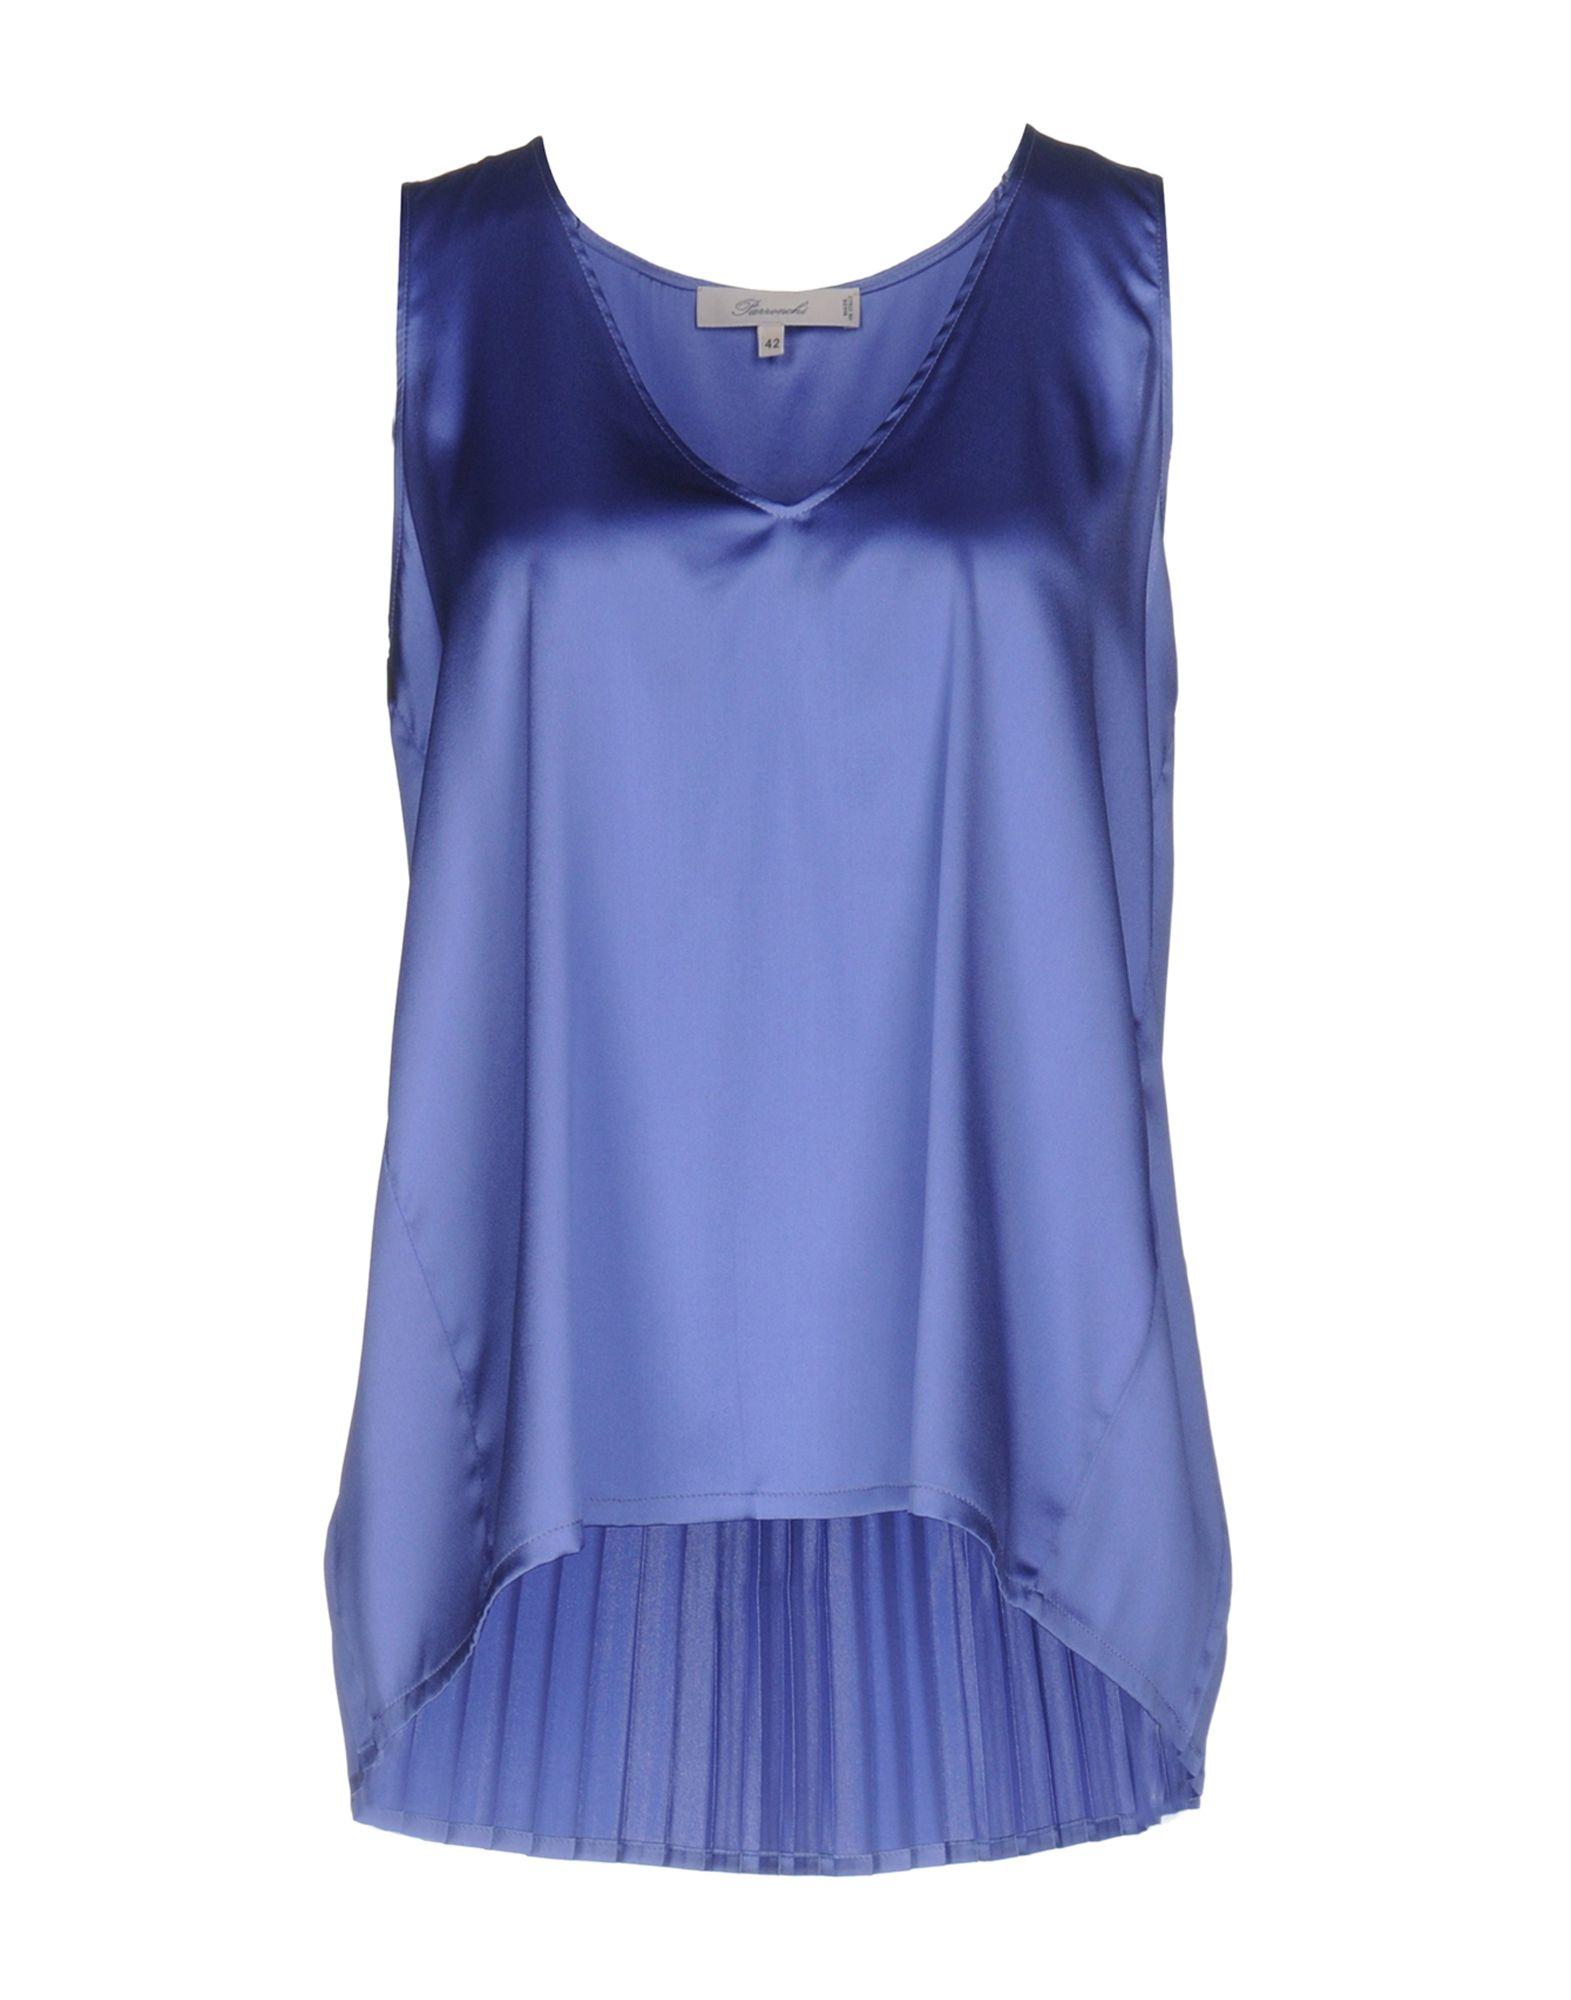 PARRONCHI Evening Top in Pastel Blue